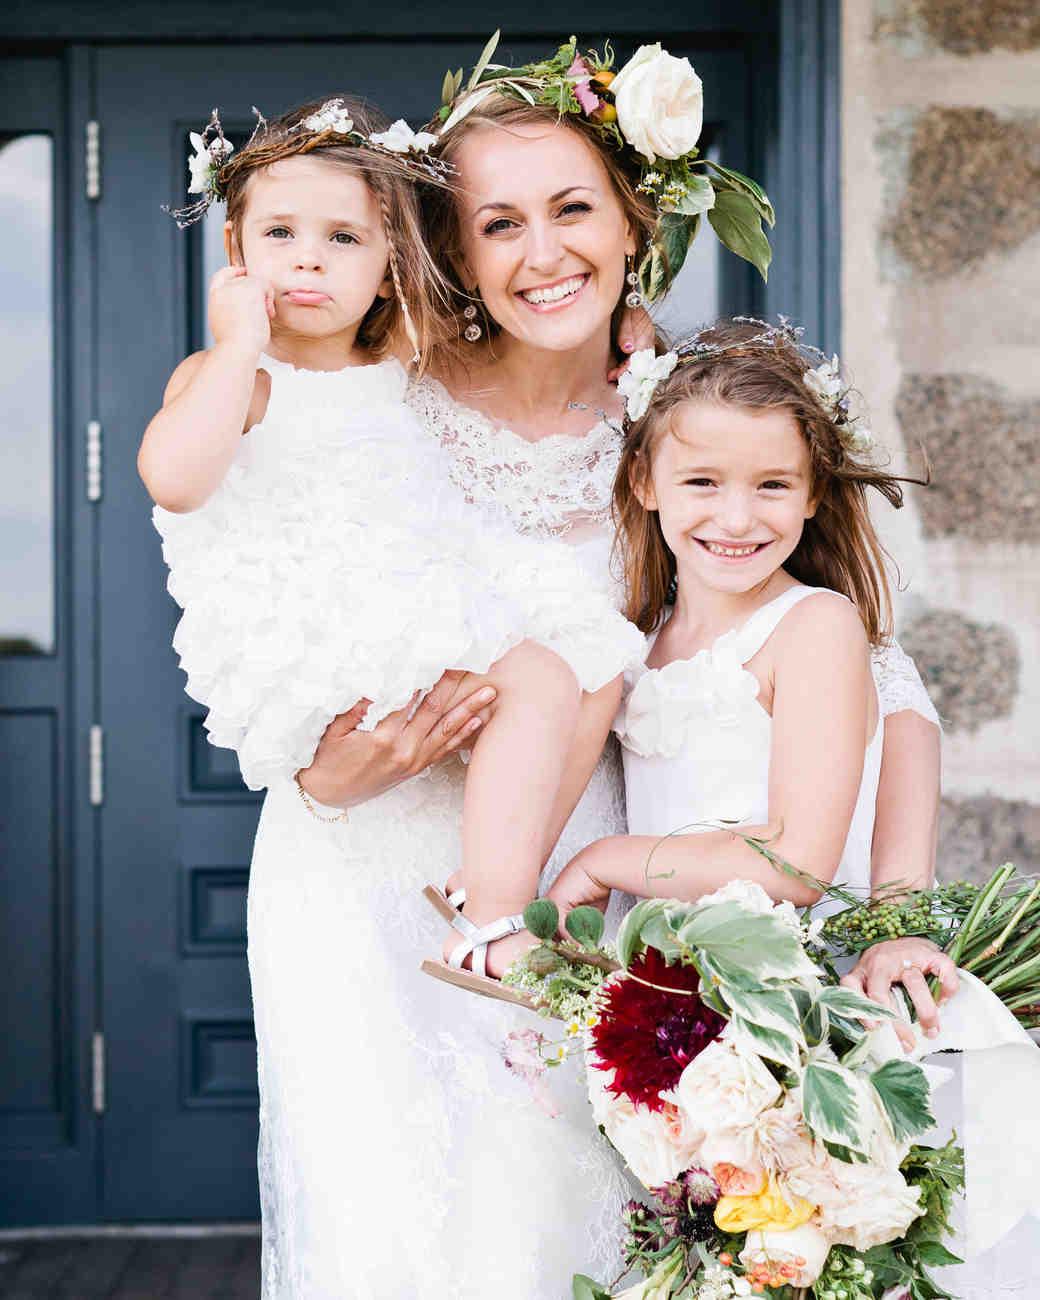 jola-tom-wedding-girls-0614.jpg